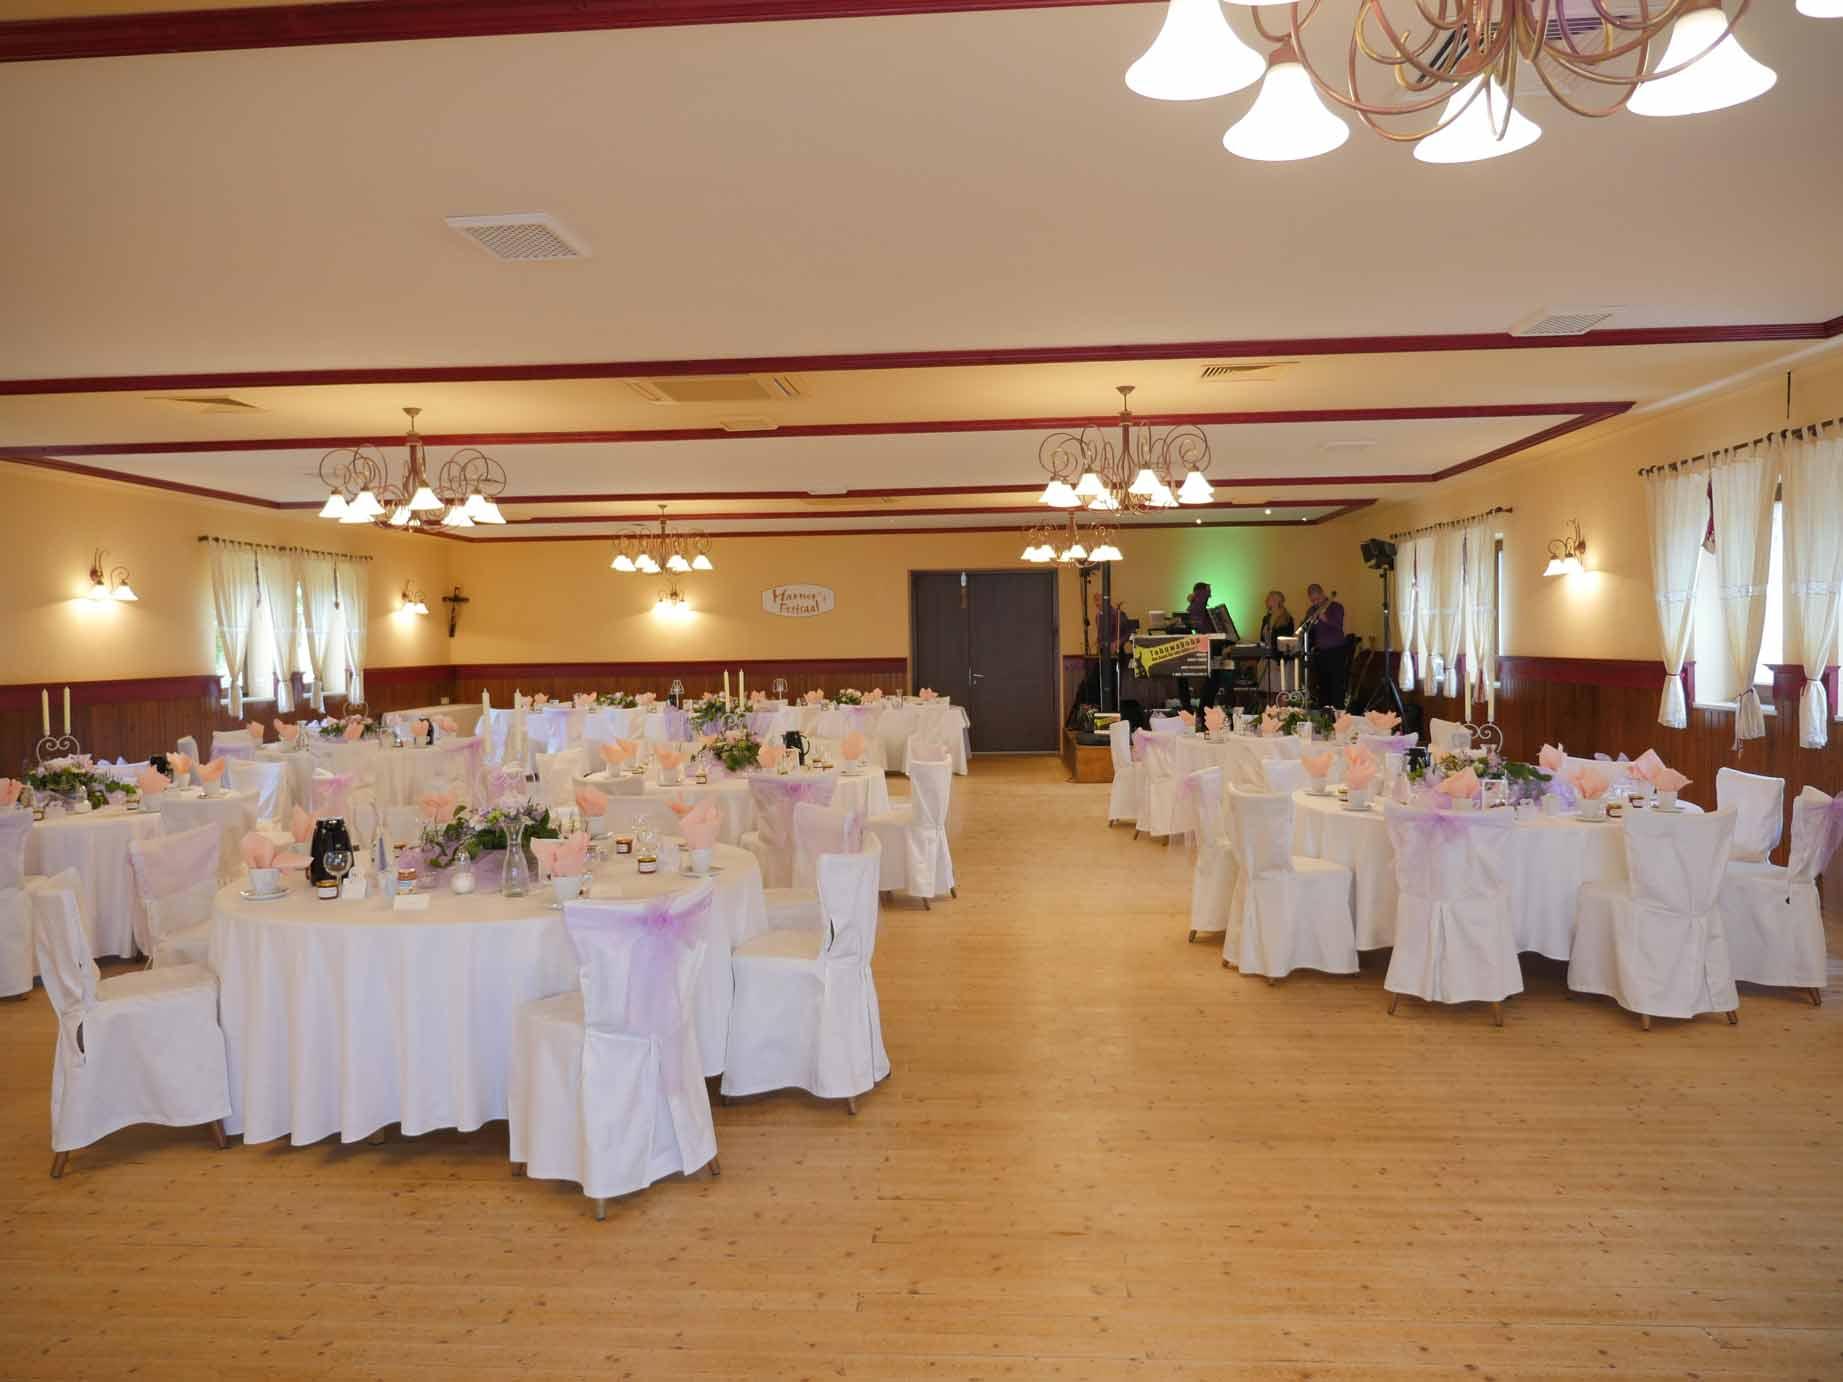 Harners-Festsaal